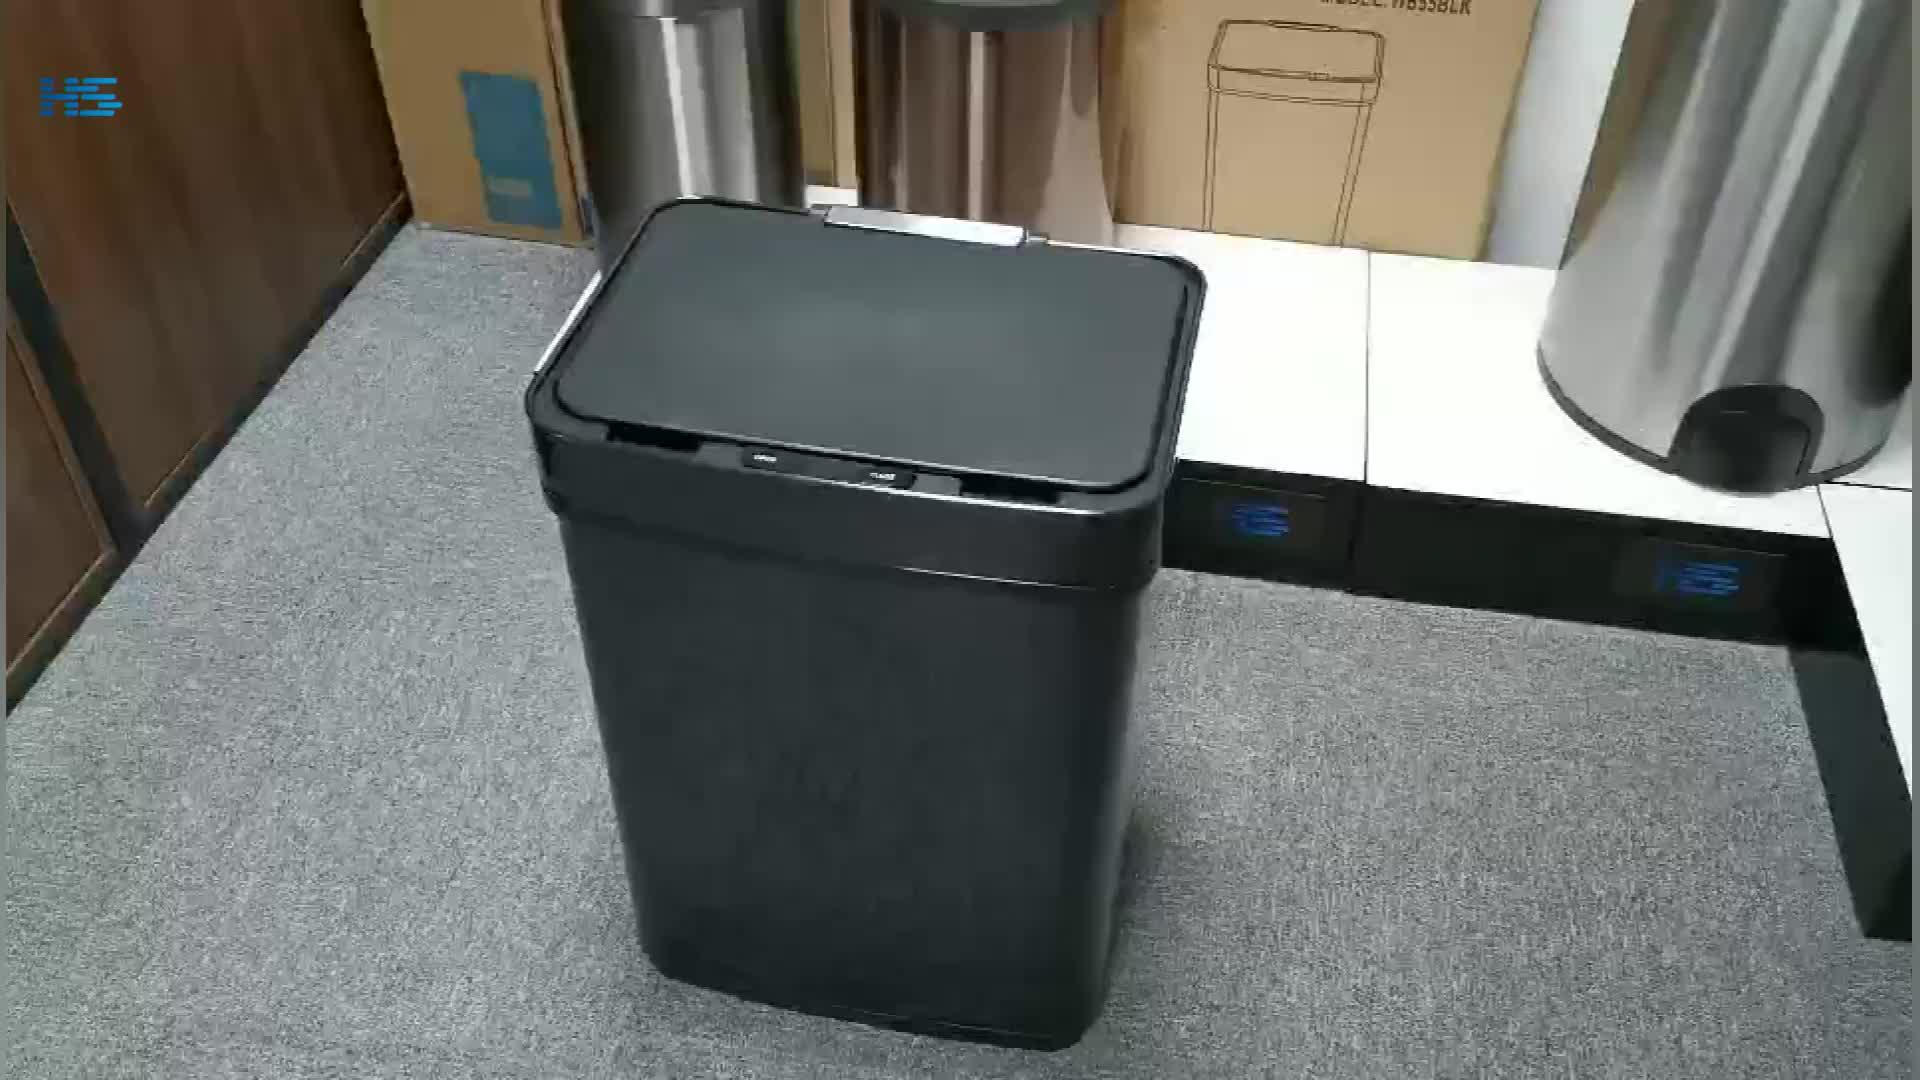 Edelstahl mülleimer recycle mülleimer stahl kompost küche bin